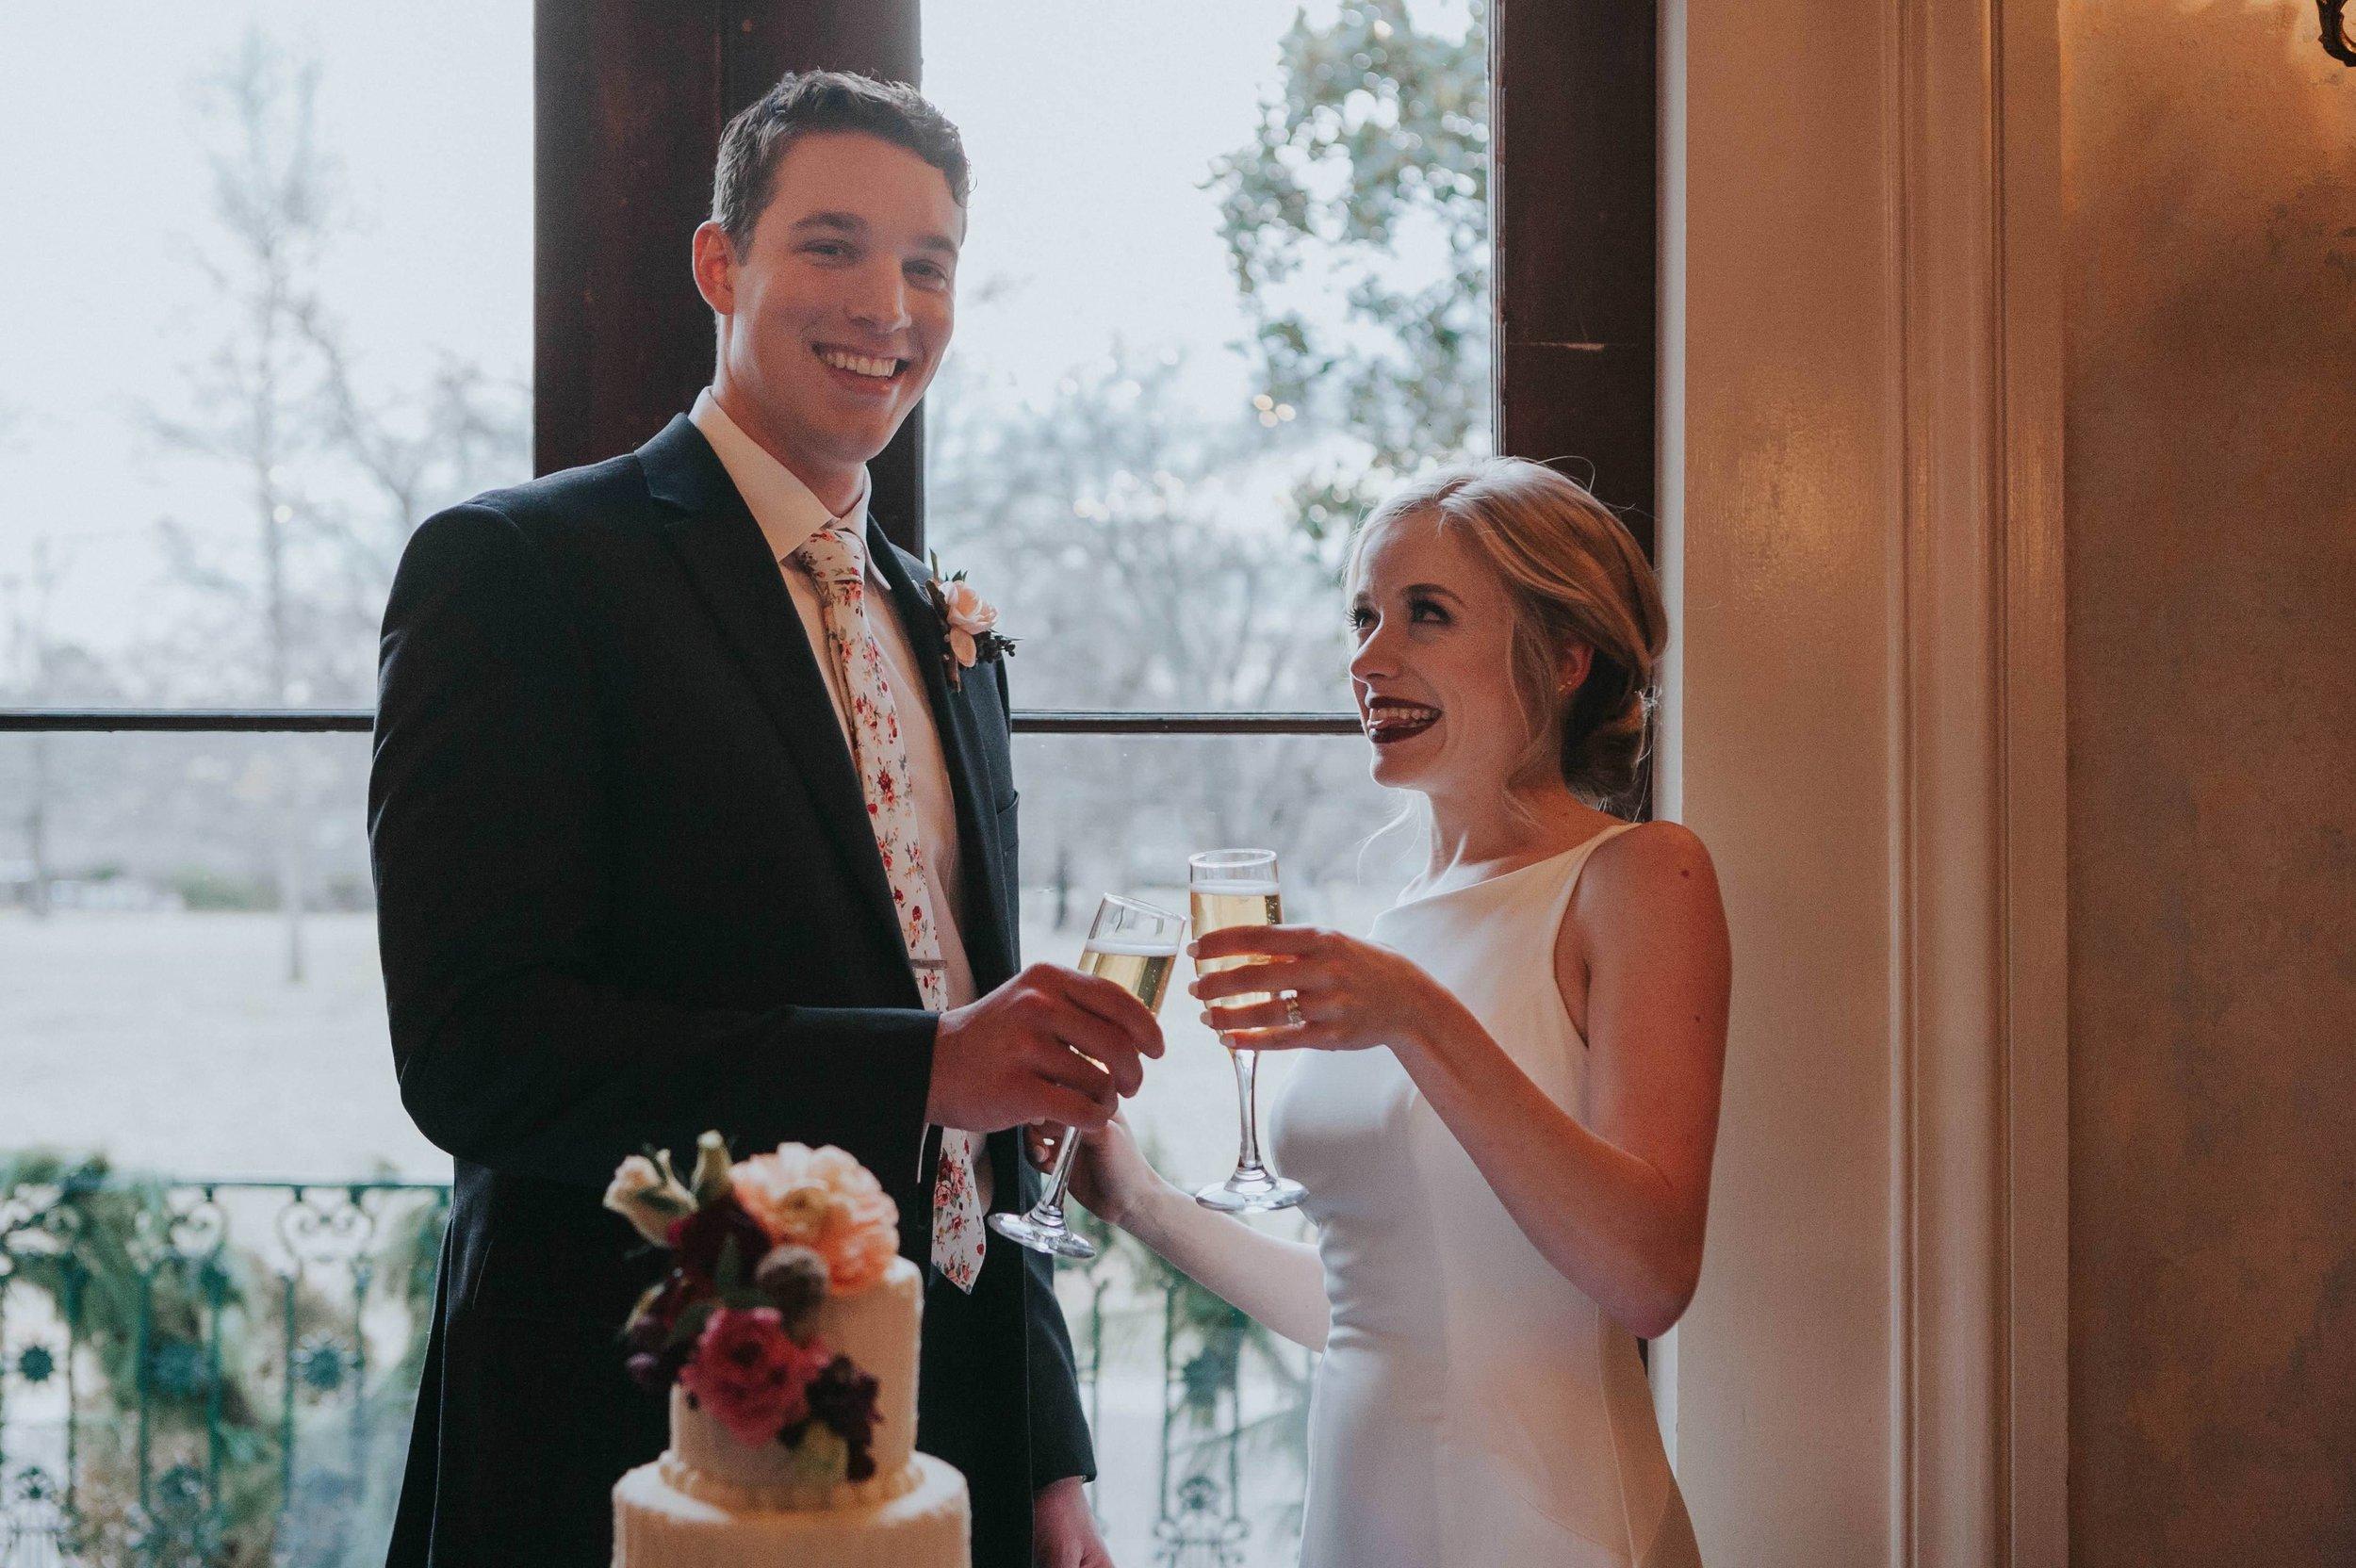 Charis_Lauren_Romantic_Wedding_Photographer_Nashville_0938.jpg